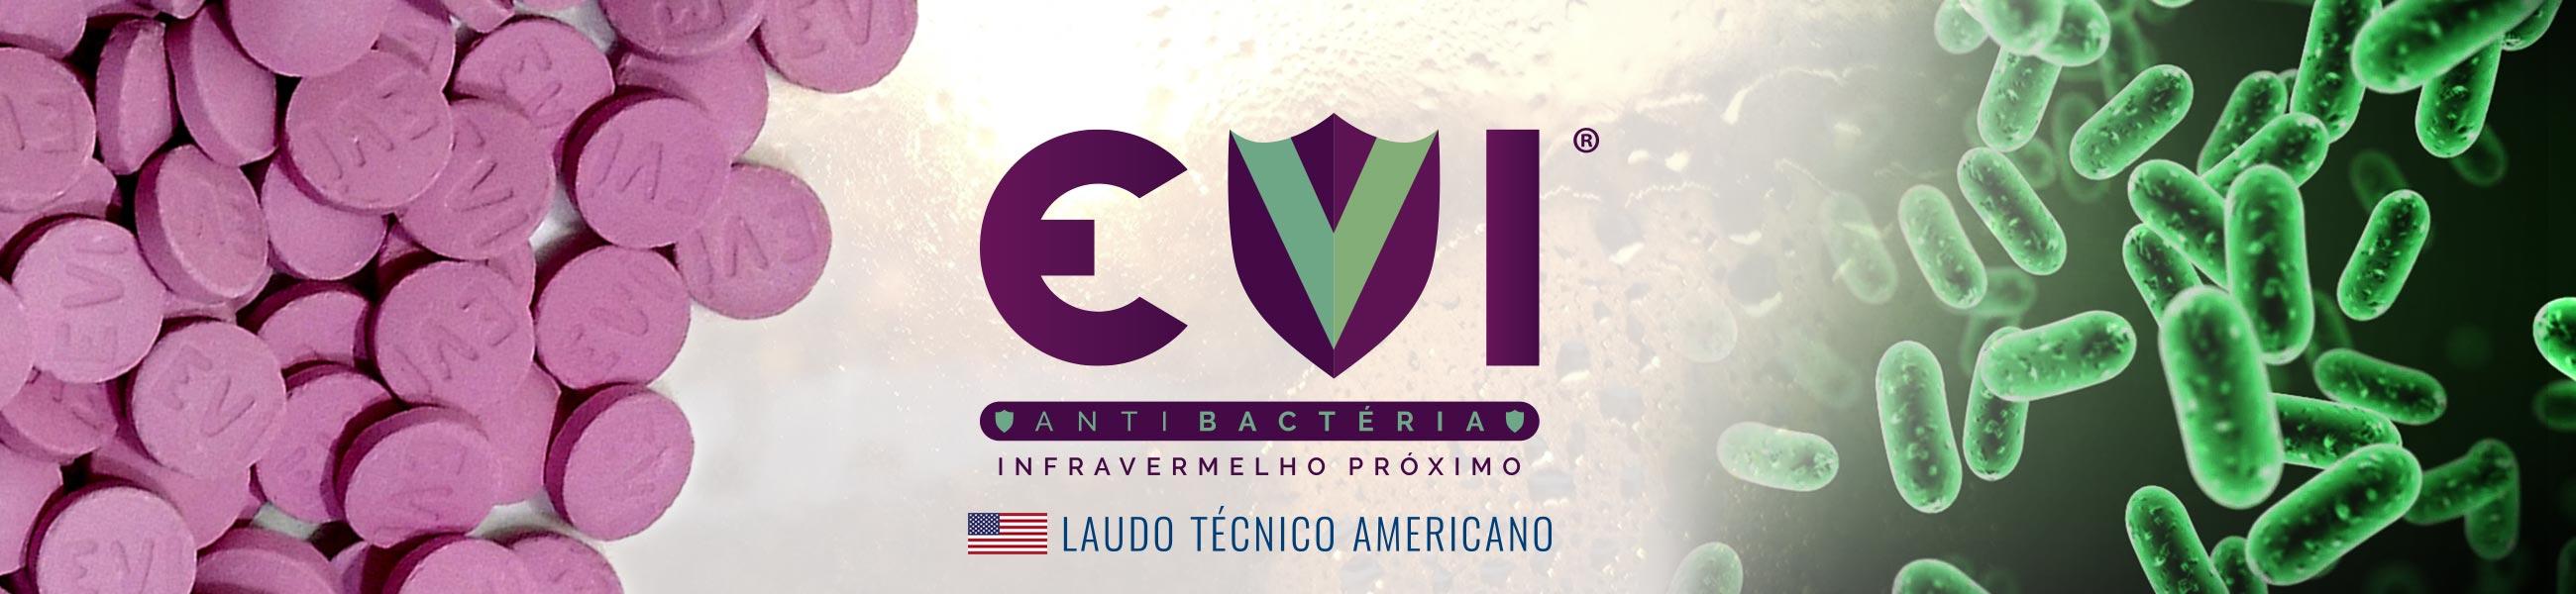 Pastilha Infravermelho Proximo Curto EVI IVL antibacteria